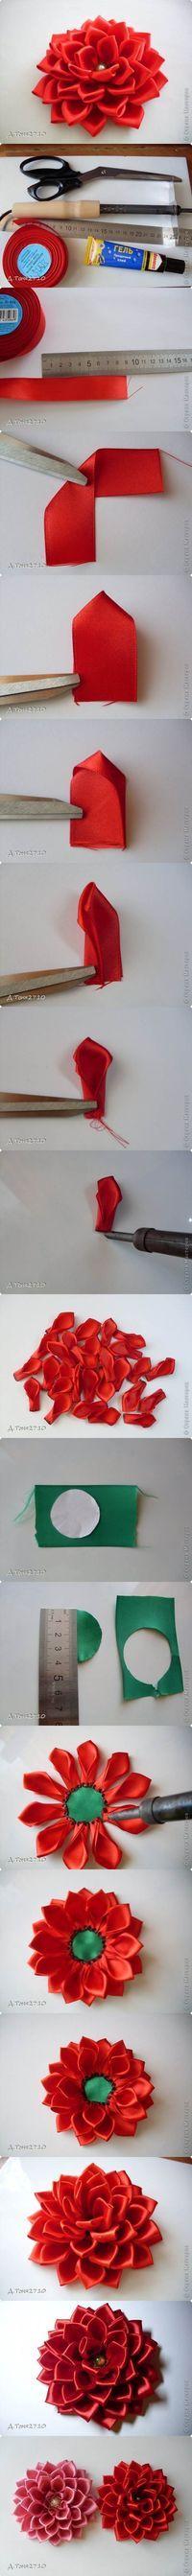 DIY Satin Ribbon Dahlia Petals | iCreativeIdeas.com LIKE Us on Facebook ==> https://www.facebook.com/icreativeideas